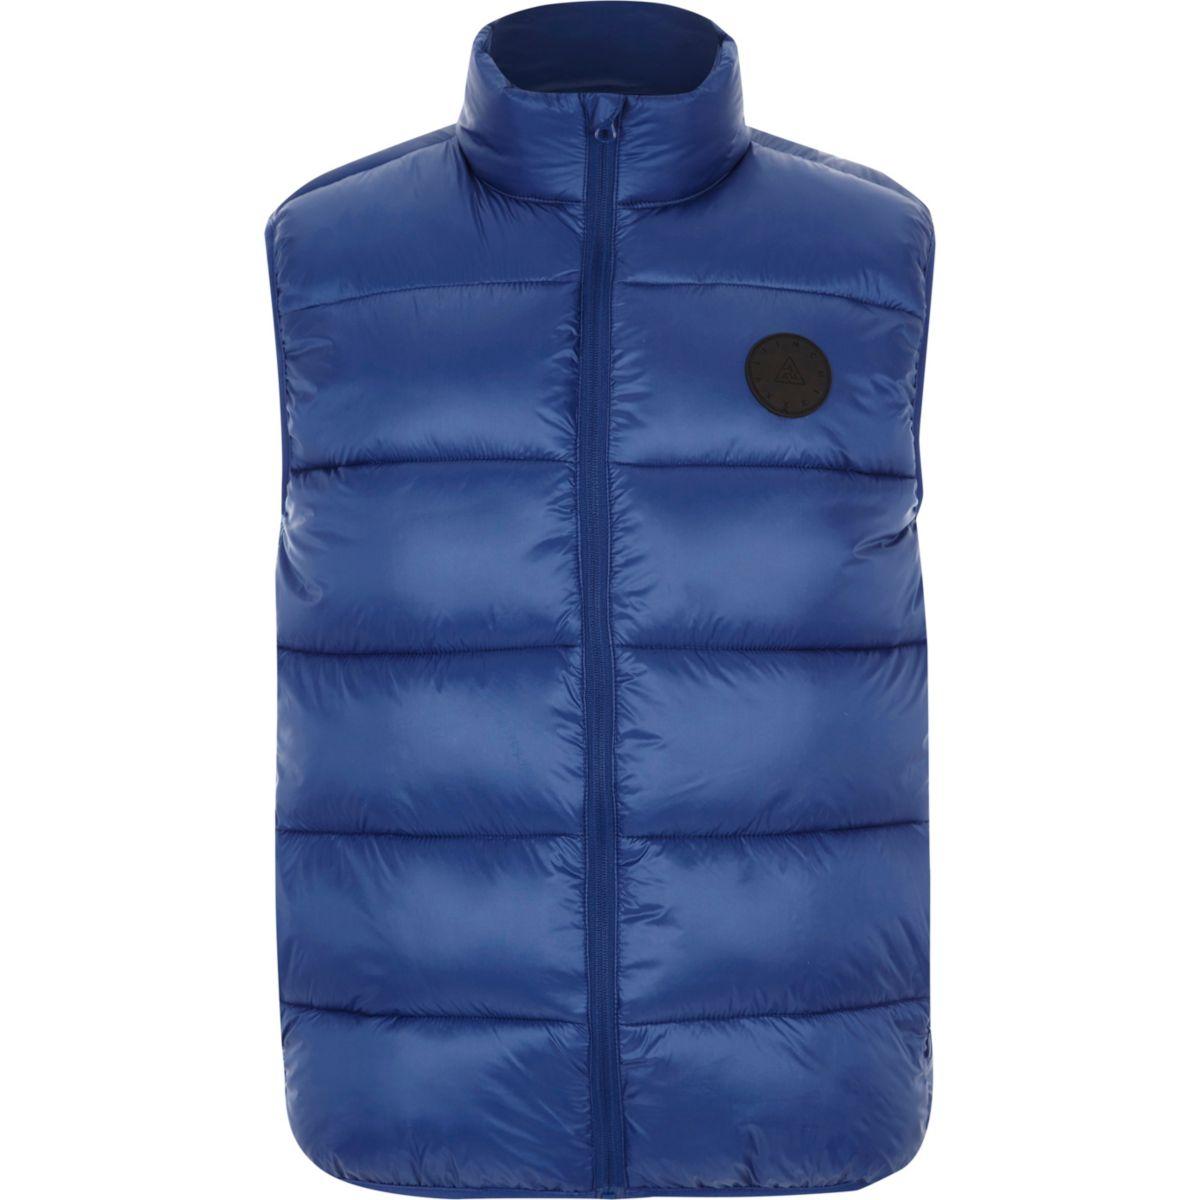 Blue funnel neck puffer vest